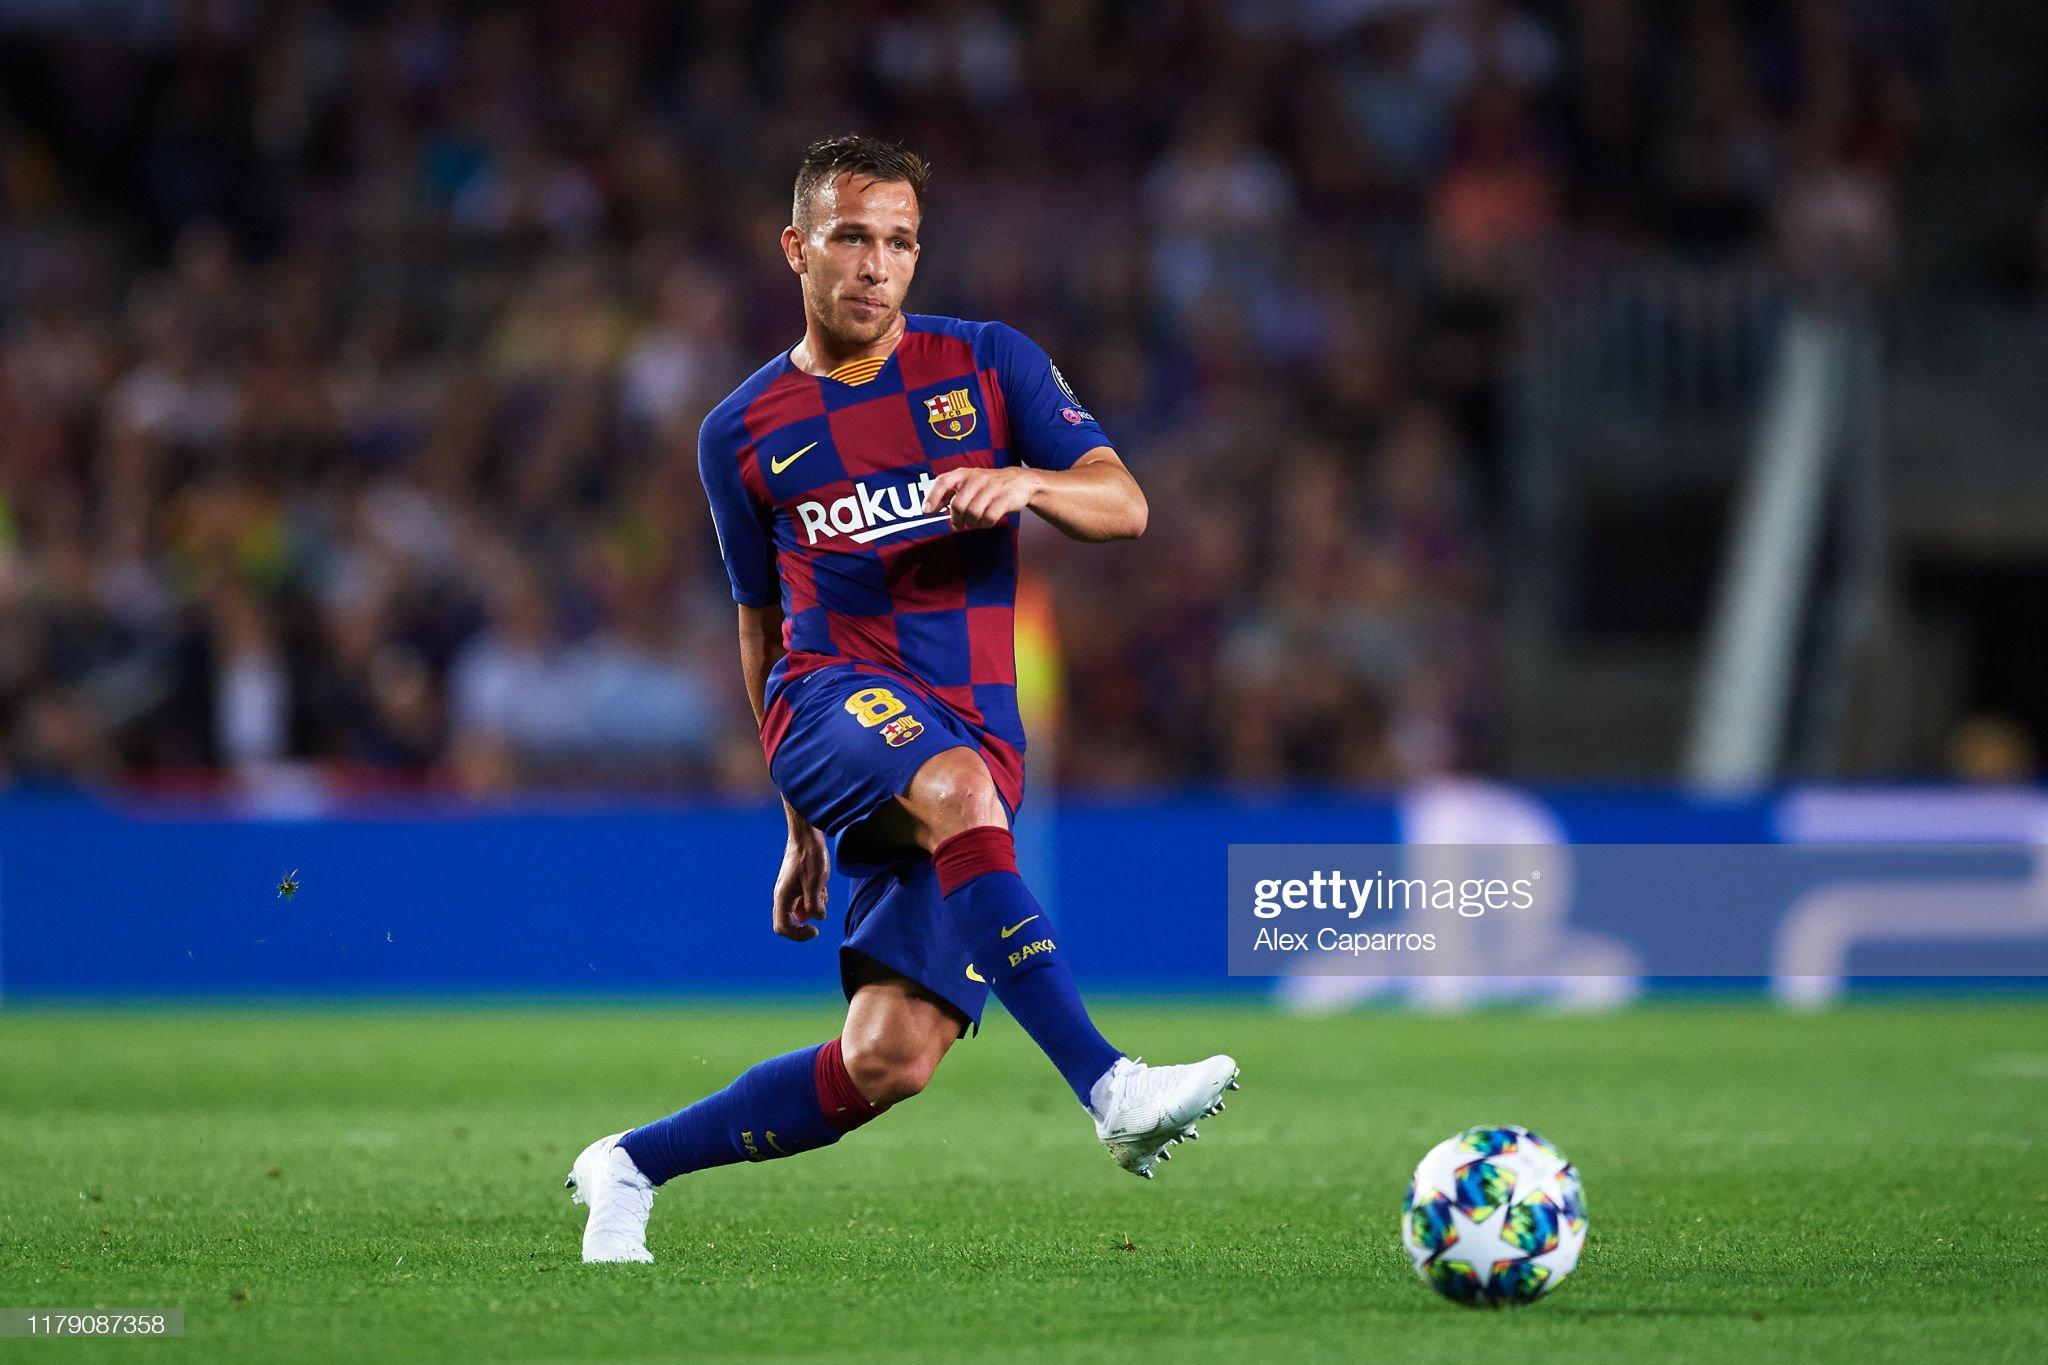 صور مباراة : برشلونة - إنتر 2-1 ( 02-10-2019 )  Arthur-melo-of-fc-barcelona-plays-the-ball-during-the-uefa-champions-picture-id1179087358?s=2048x2048